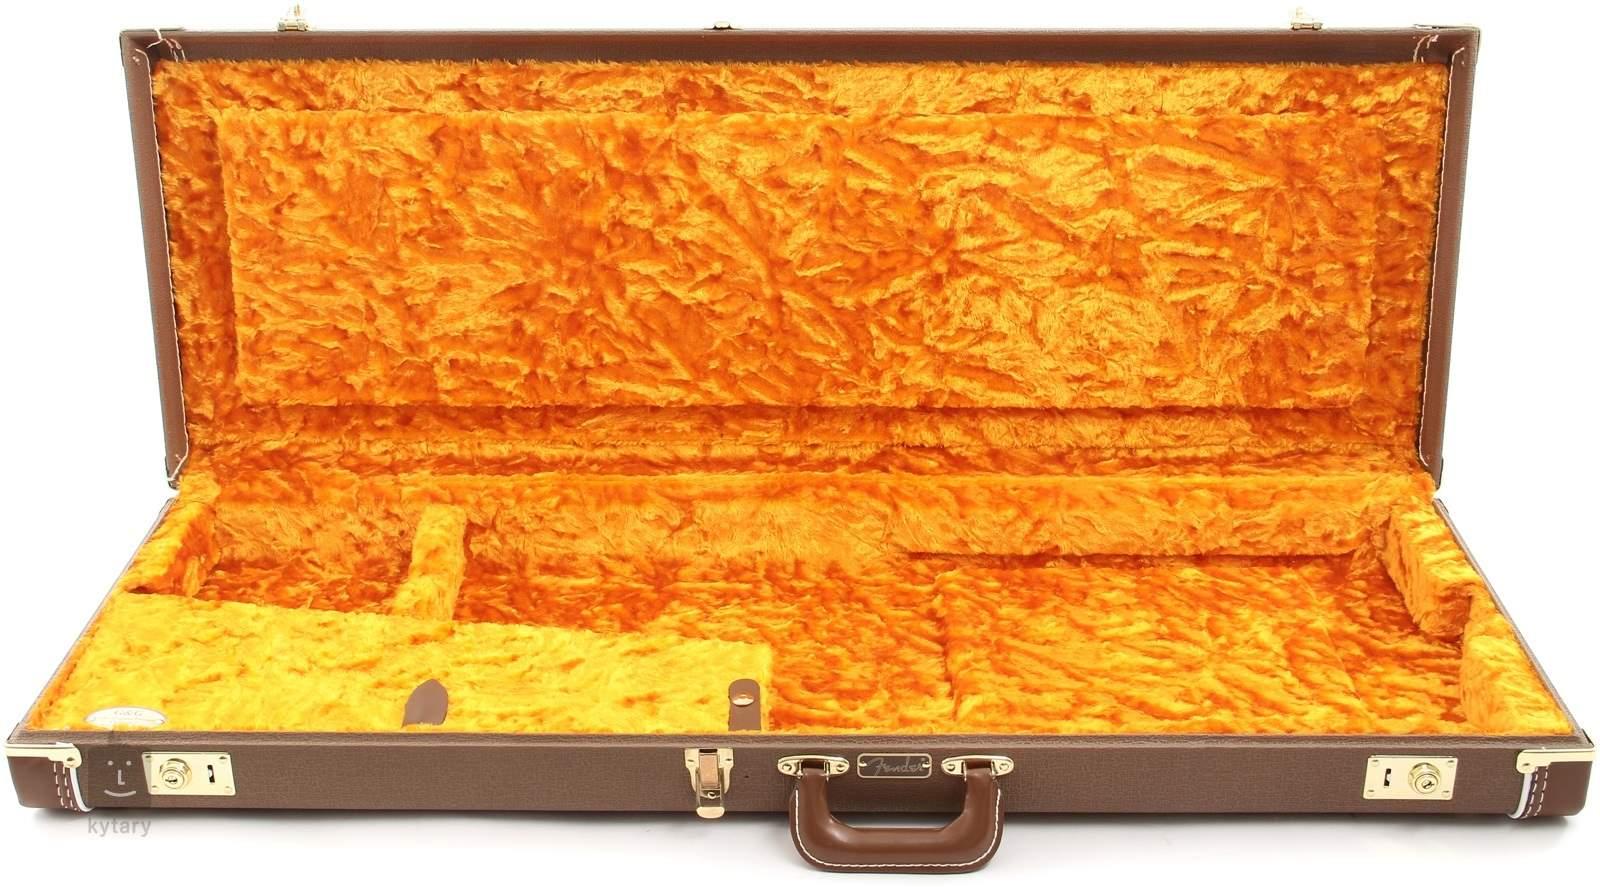 5441ca3ce44 FENDER G&G Deluxe Hardshell Case Brown - Stratocaster/Telecaster Electric  Guitar Hard Case